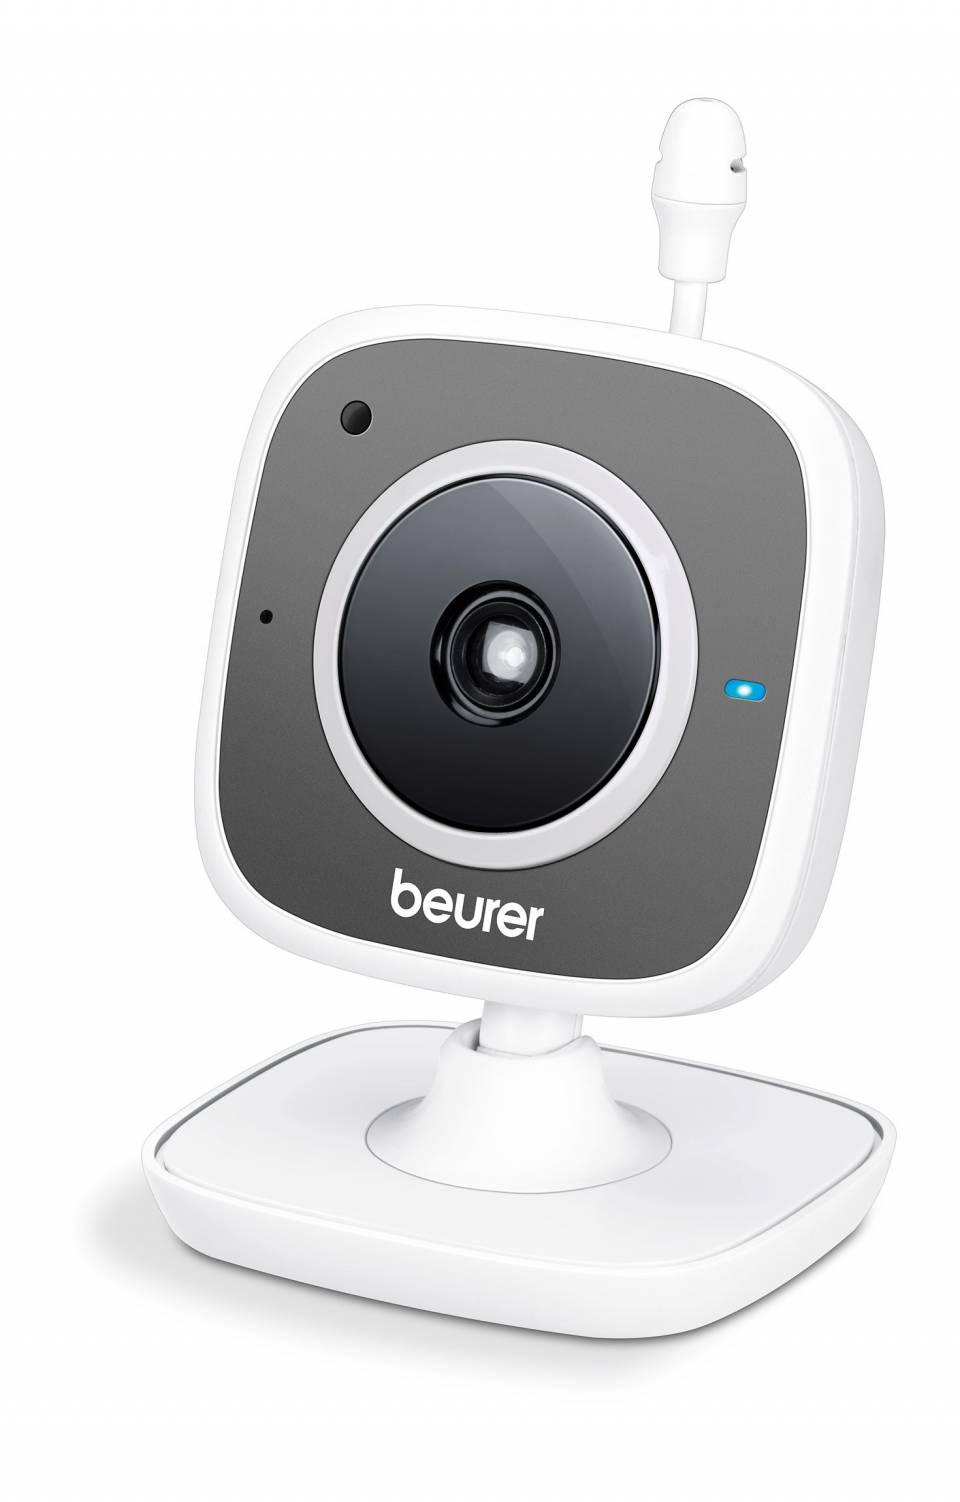 Beurer Babyphone BY 88 Smart mit Geräusch-, Bewegungs-, Temperaturalarm.